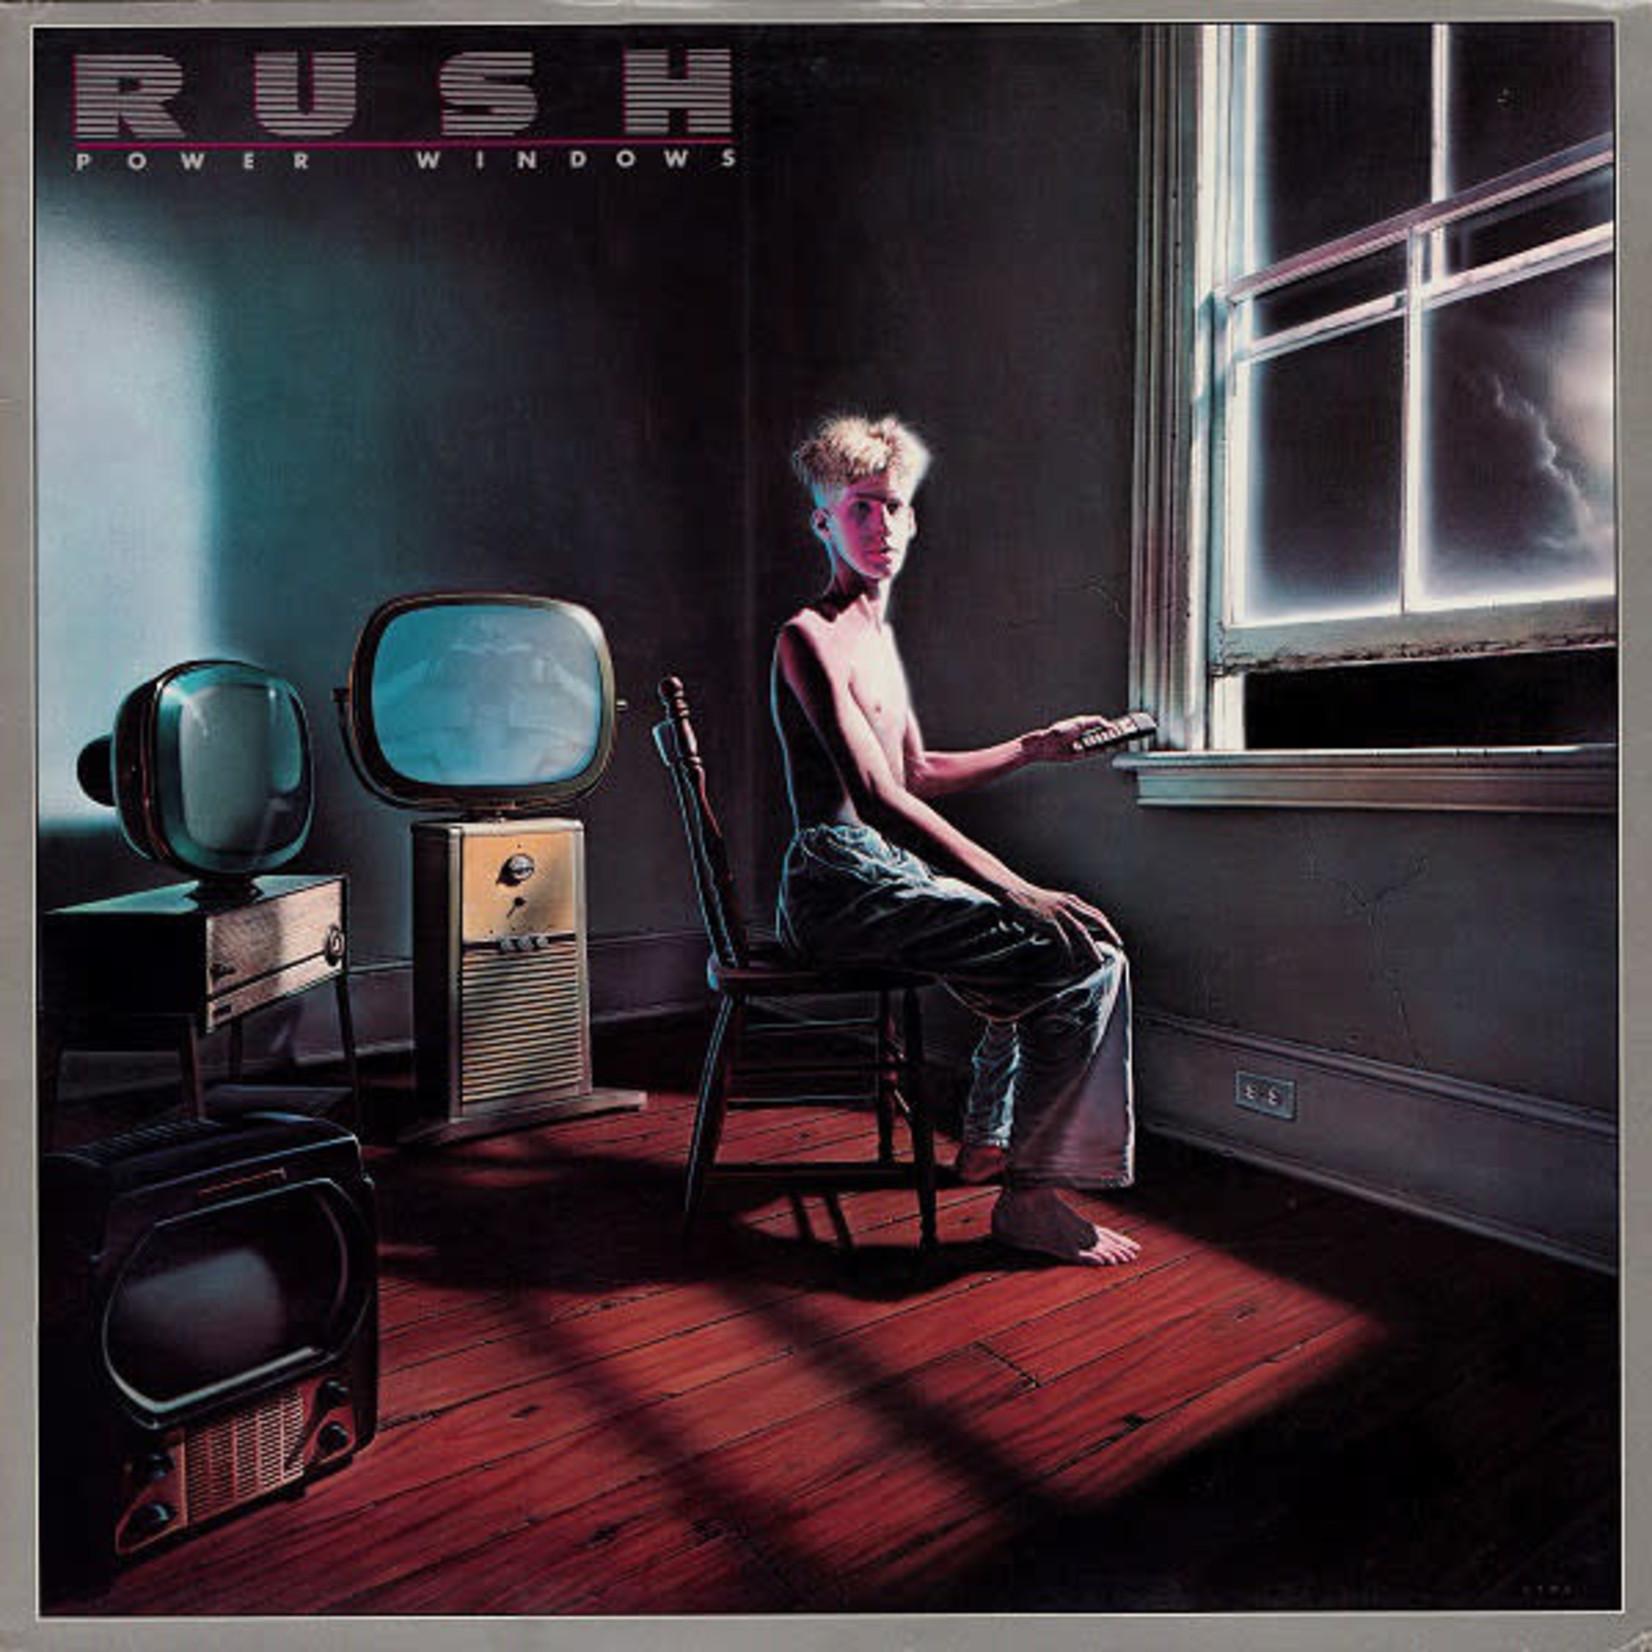 [Vintage] Rush: Power Windows